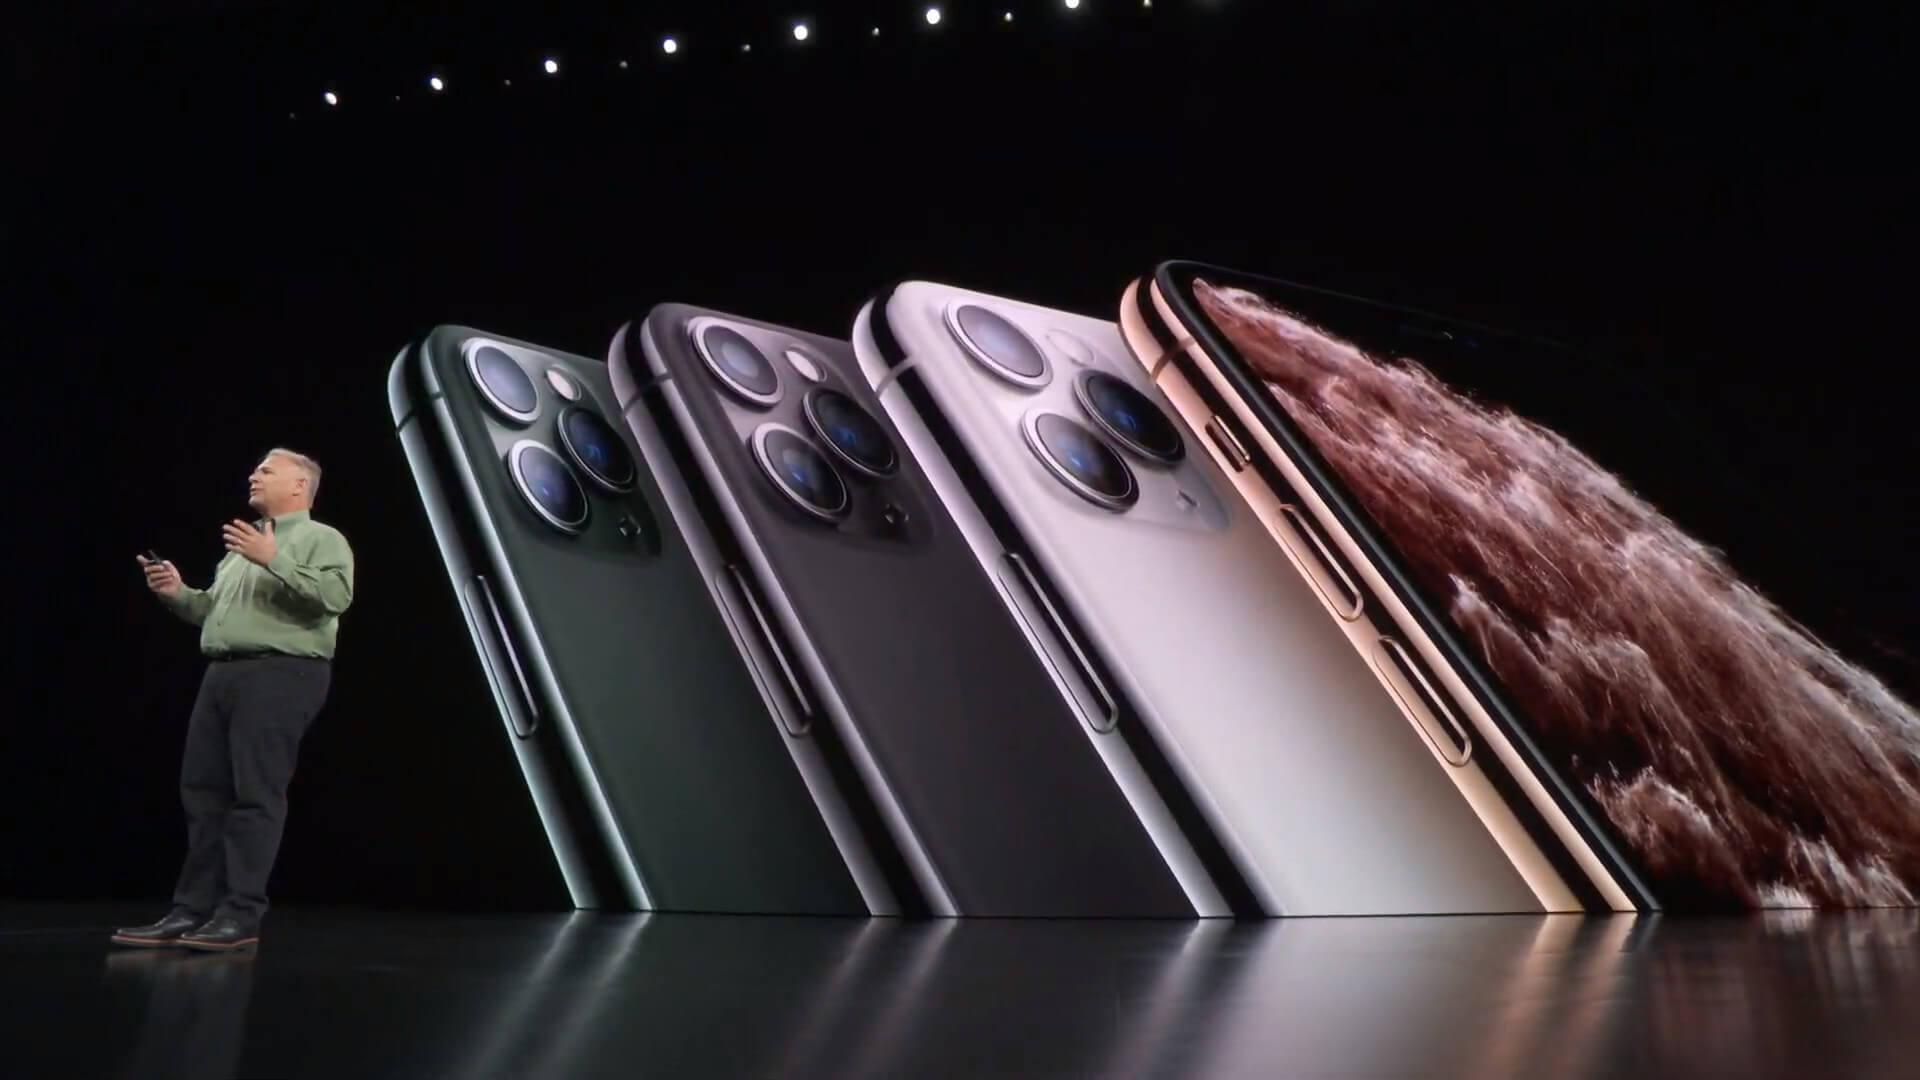 iPhone 11 Pro Max, Айфон 11 Про Макс